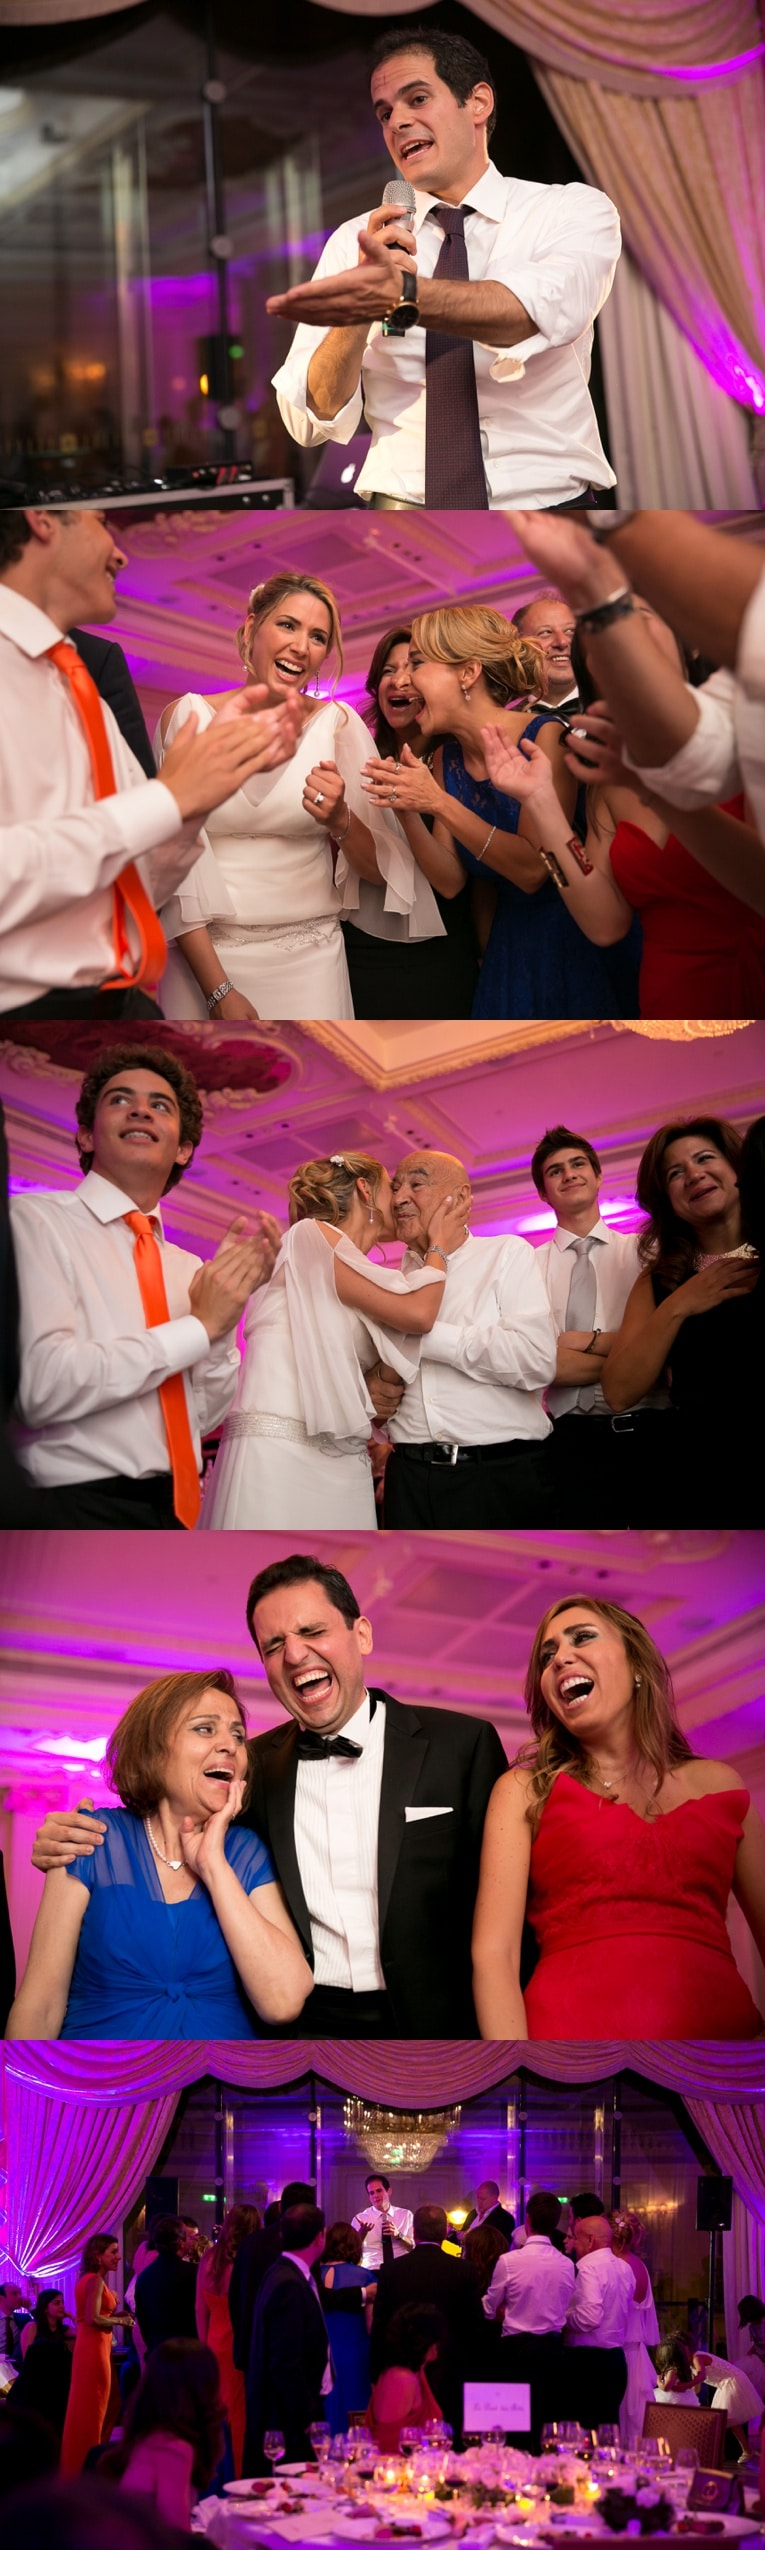 wedding-shangri-la-hotel-paris_0016